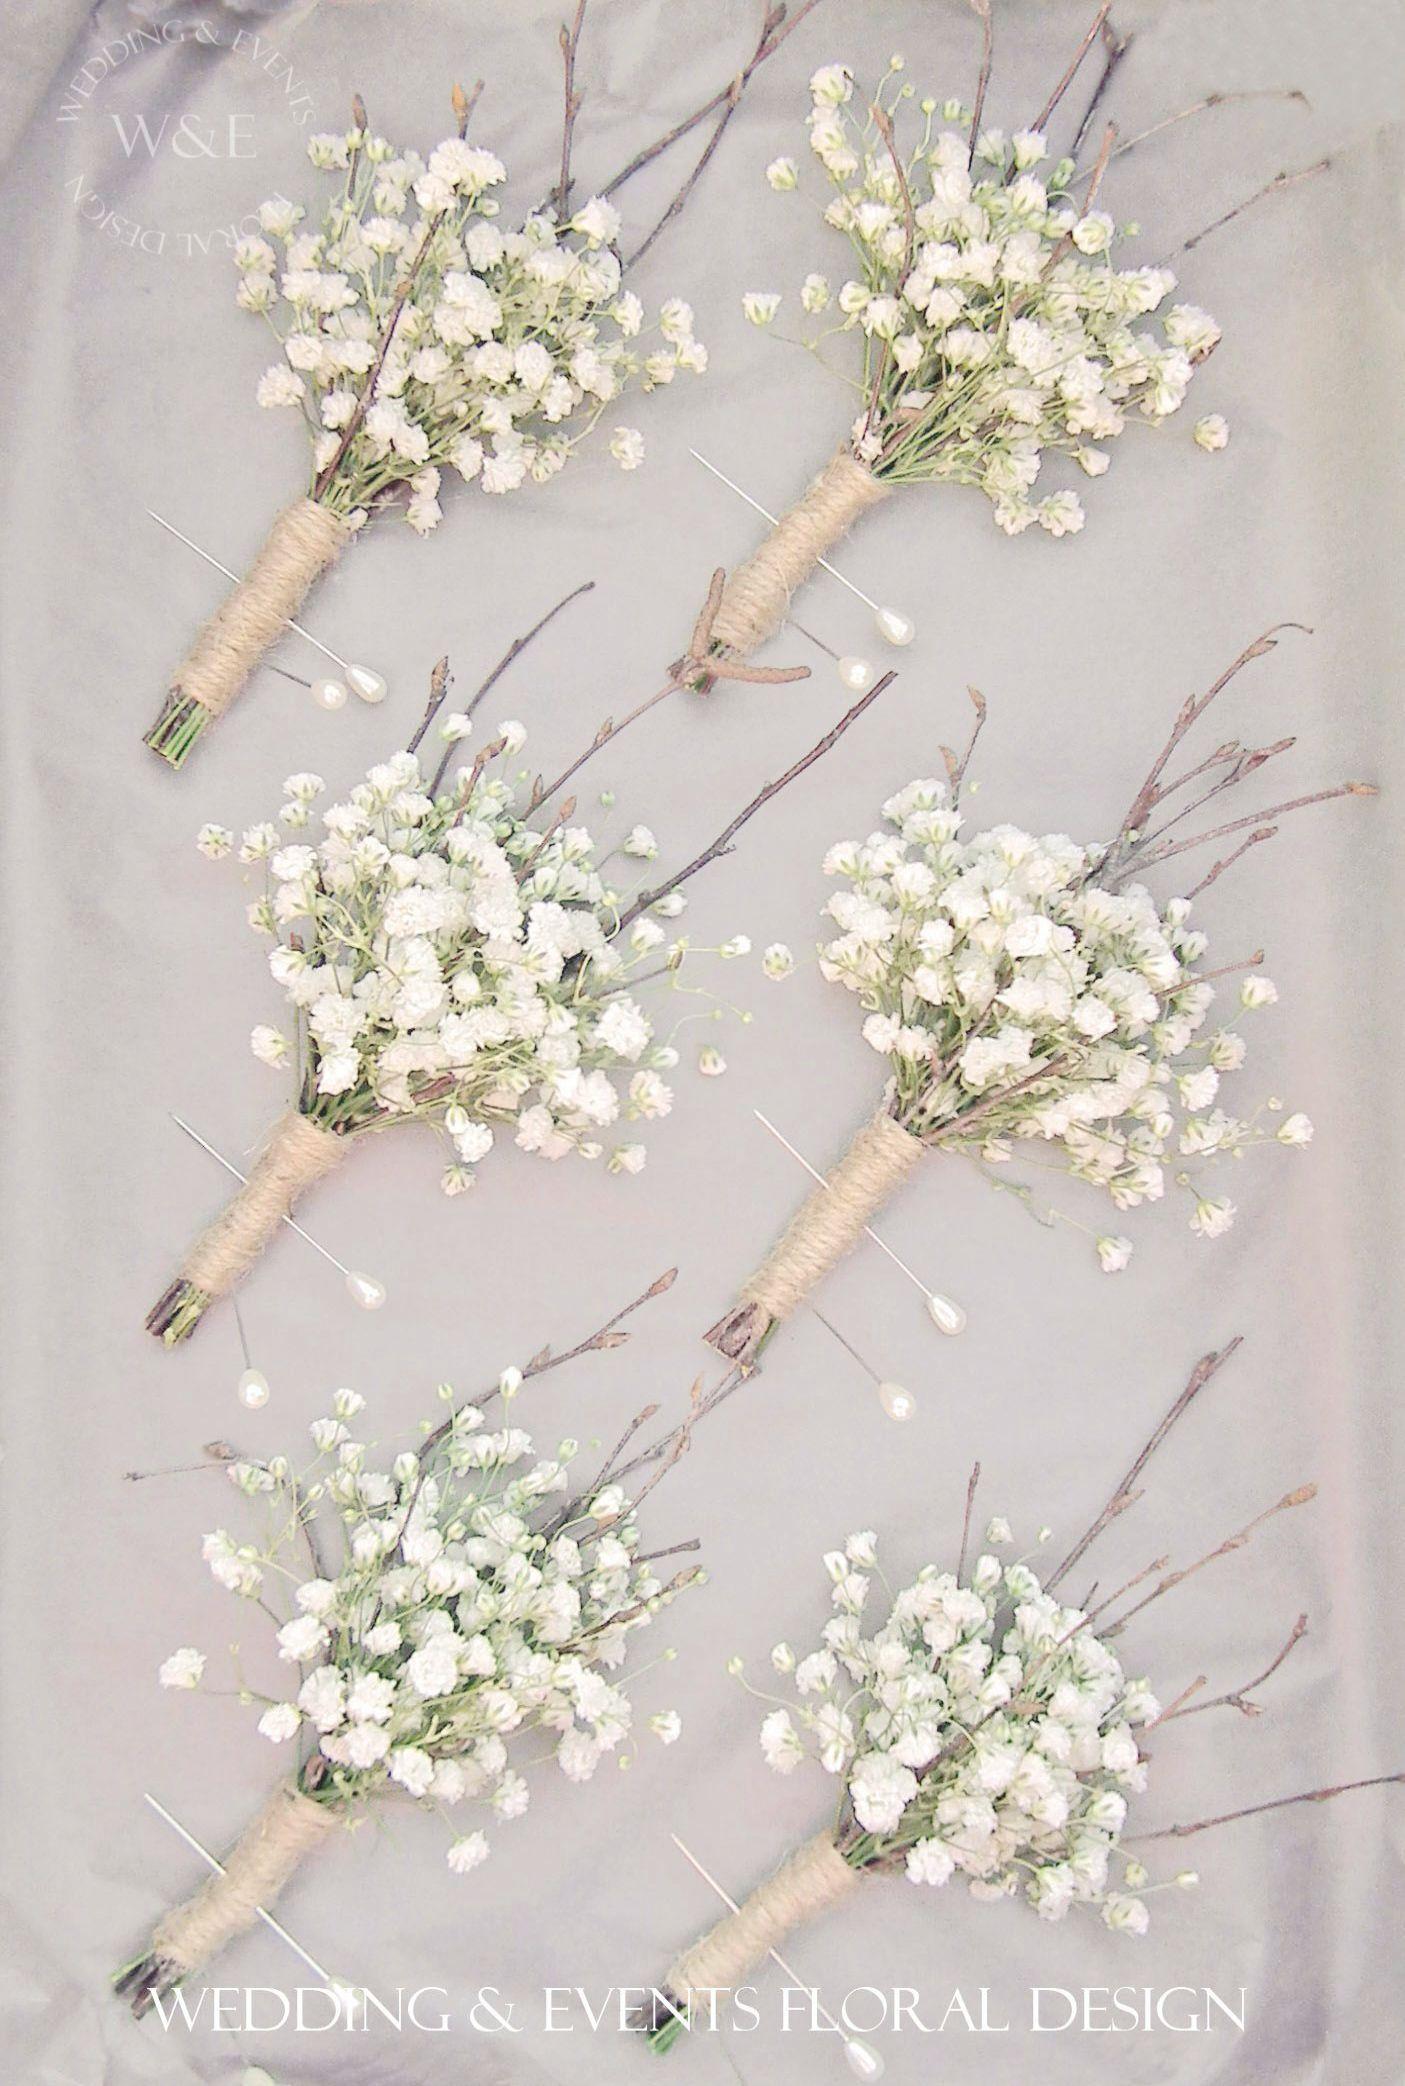 Wedding Guest Dresses Plus Size Among Wedding Games Between Wedding Invitations Eco Friendly Soon Wedding Wedding Flowers Wedding Bouquets Babys Breath Wedding